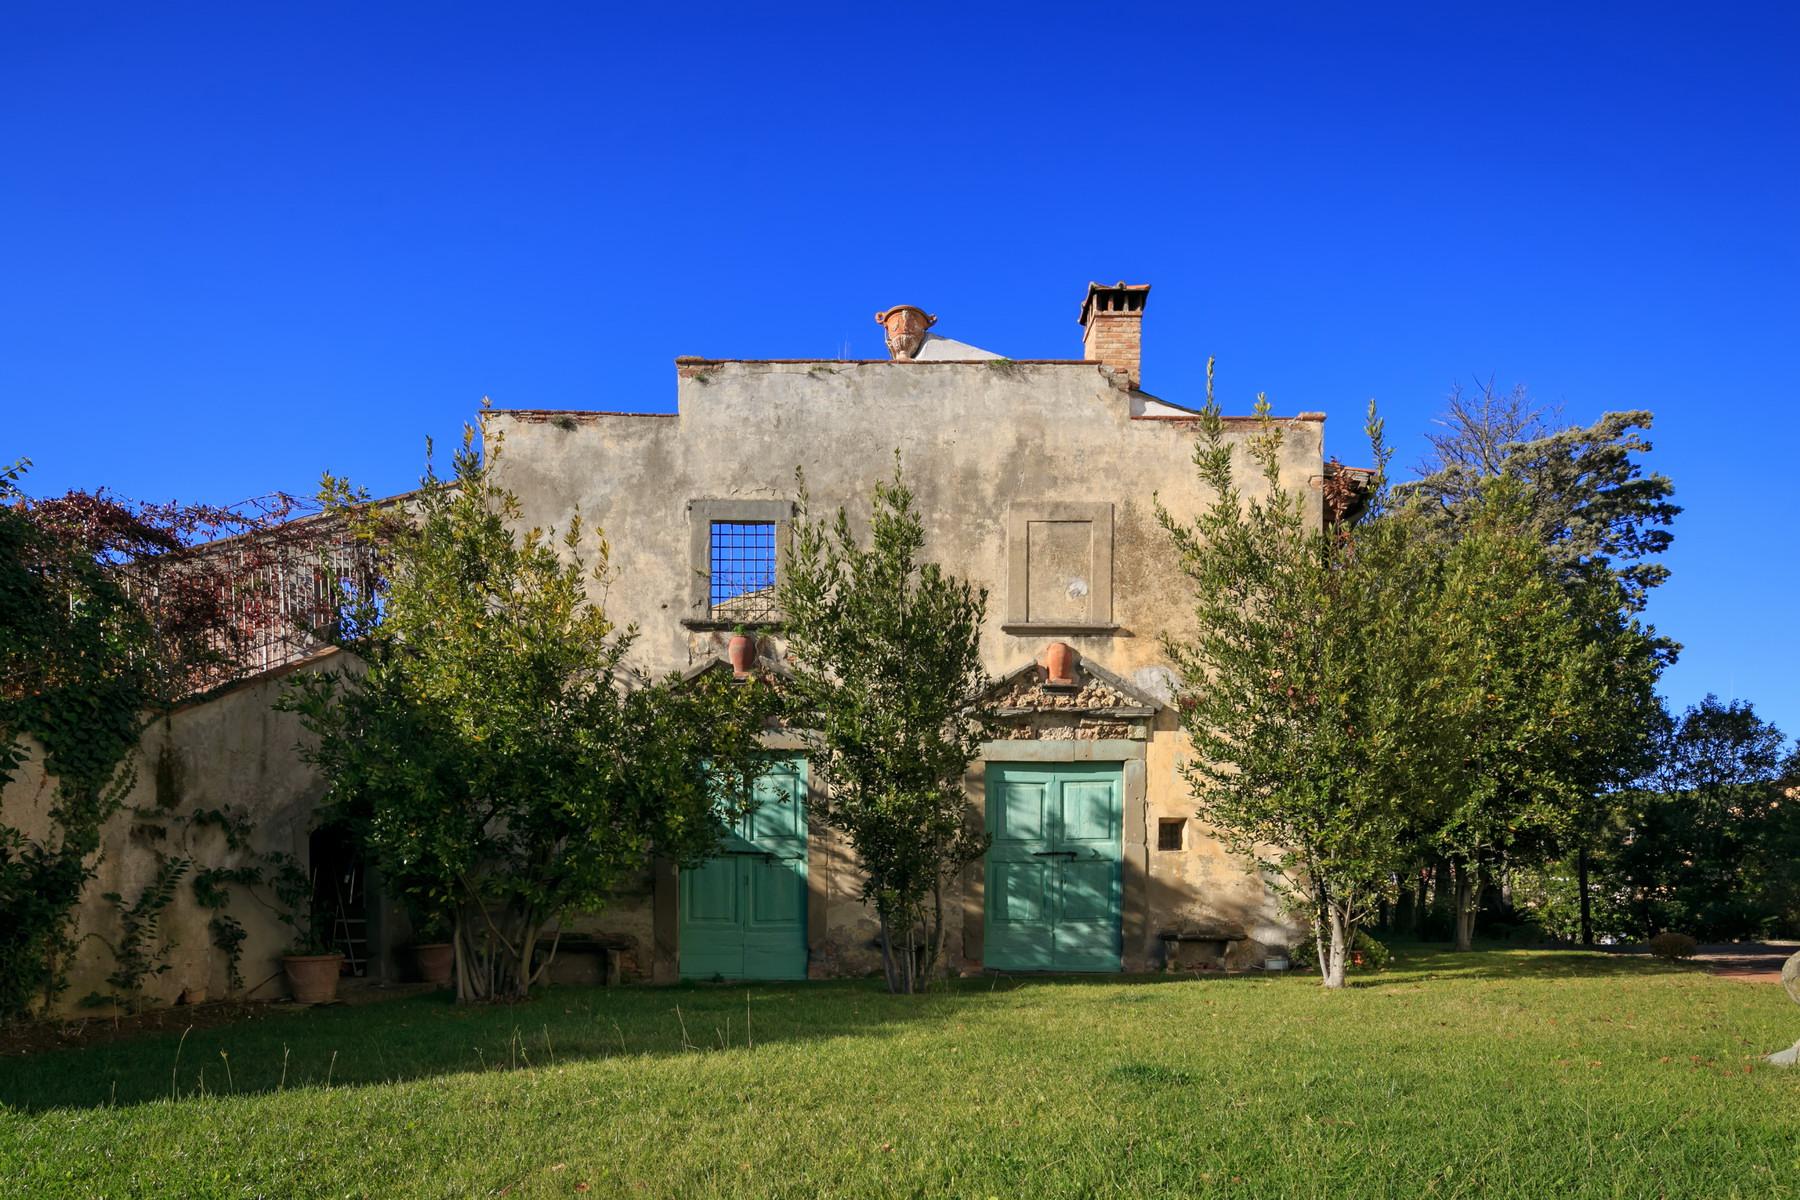 Villa in Vendita a Casciana Terme Lari: 5 locali, 550 mq - Foto 15